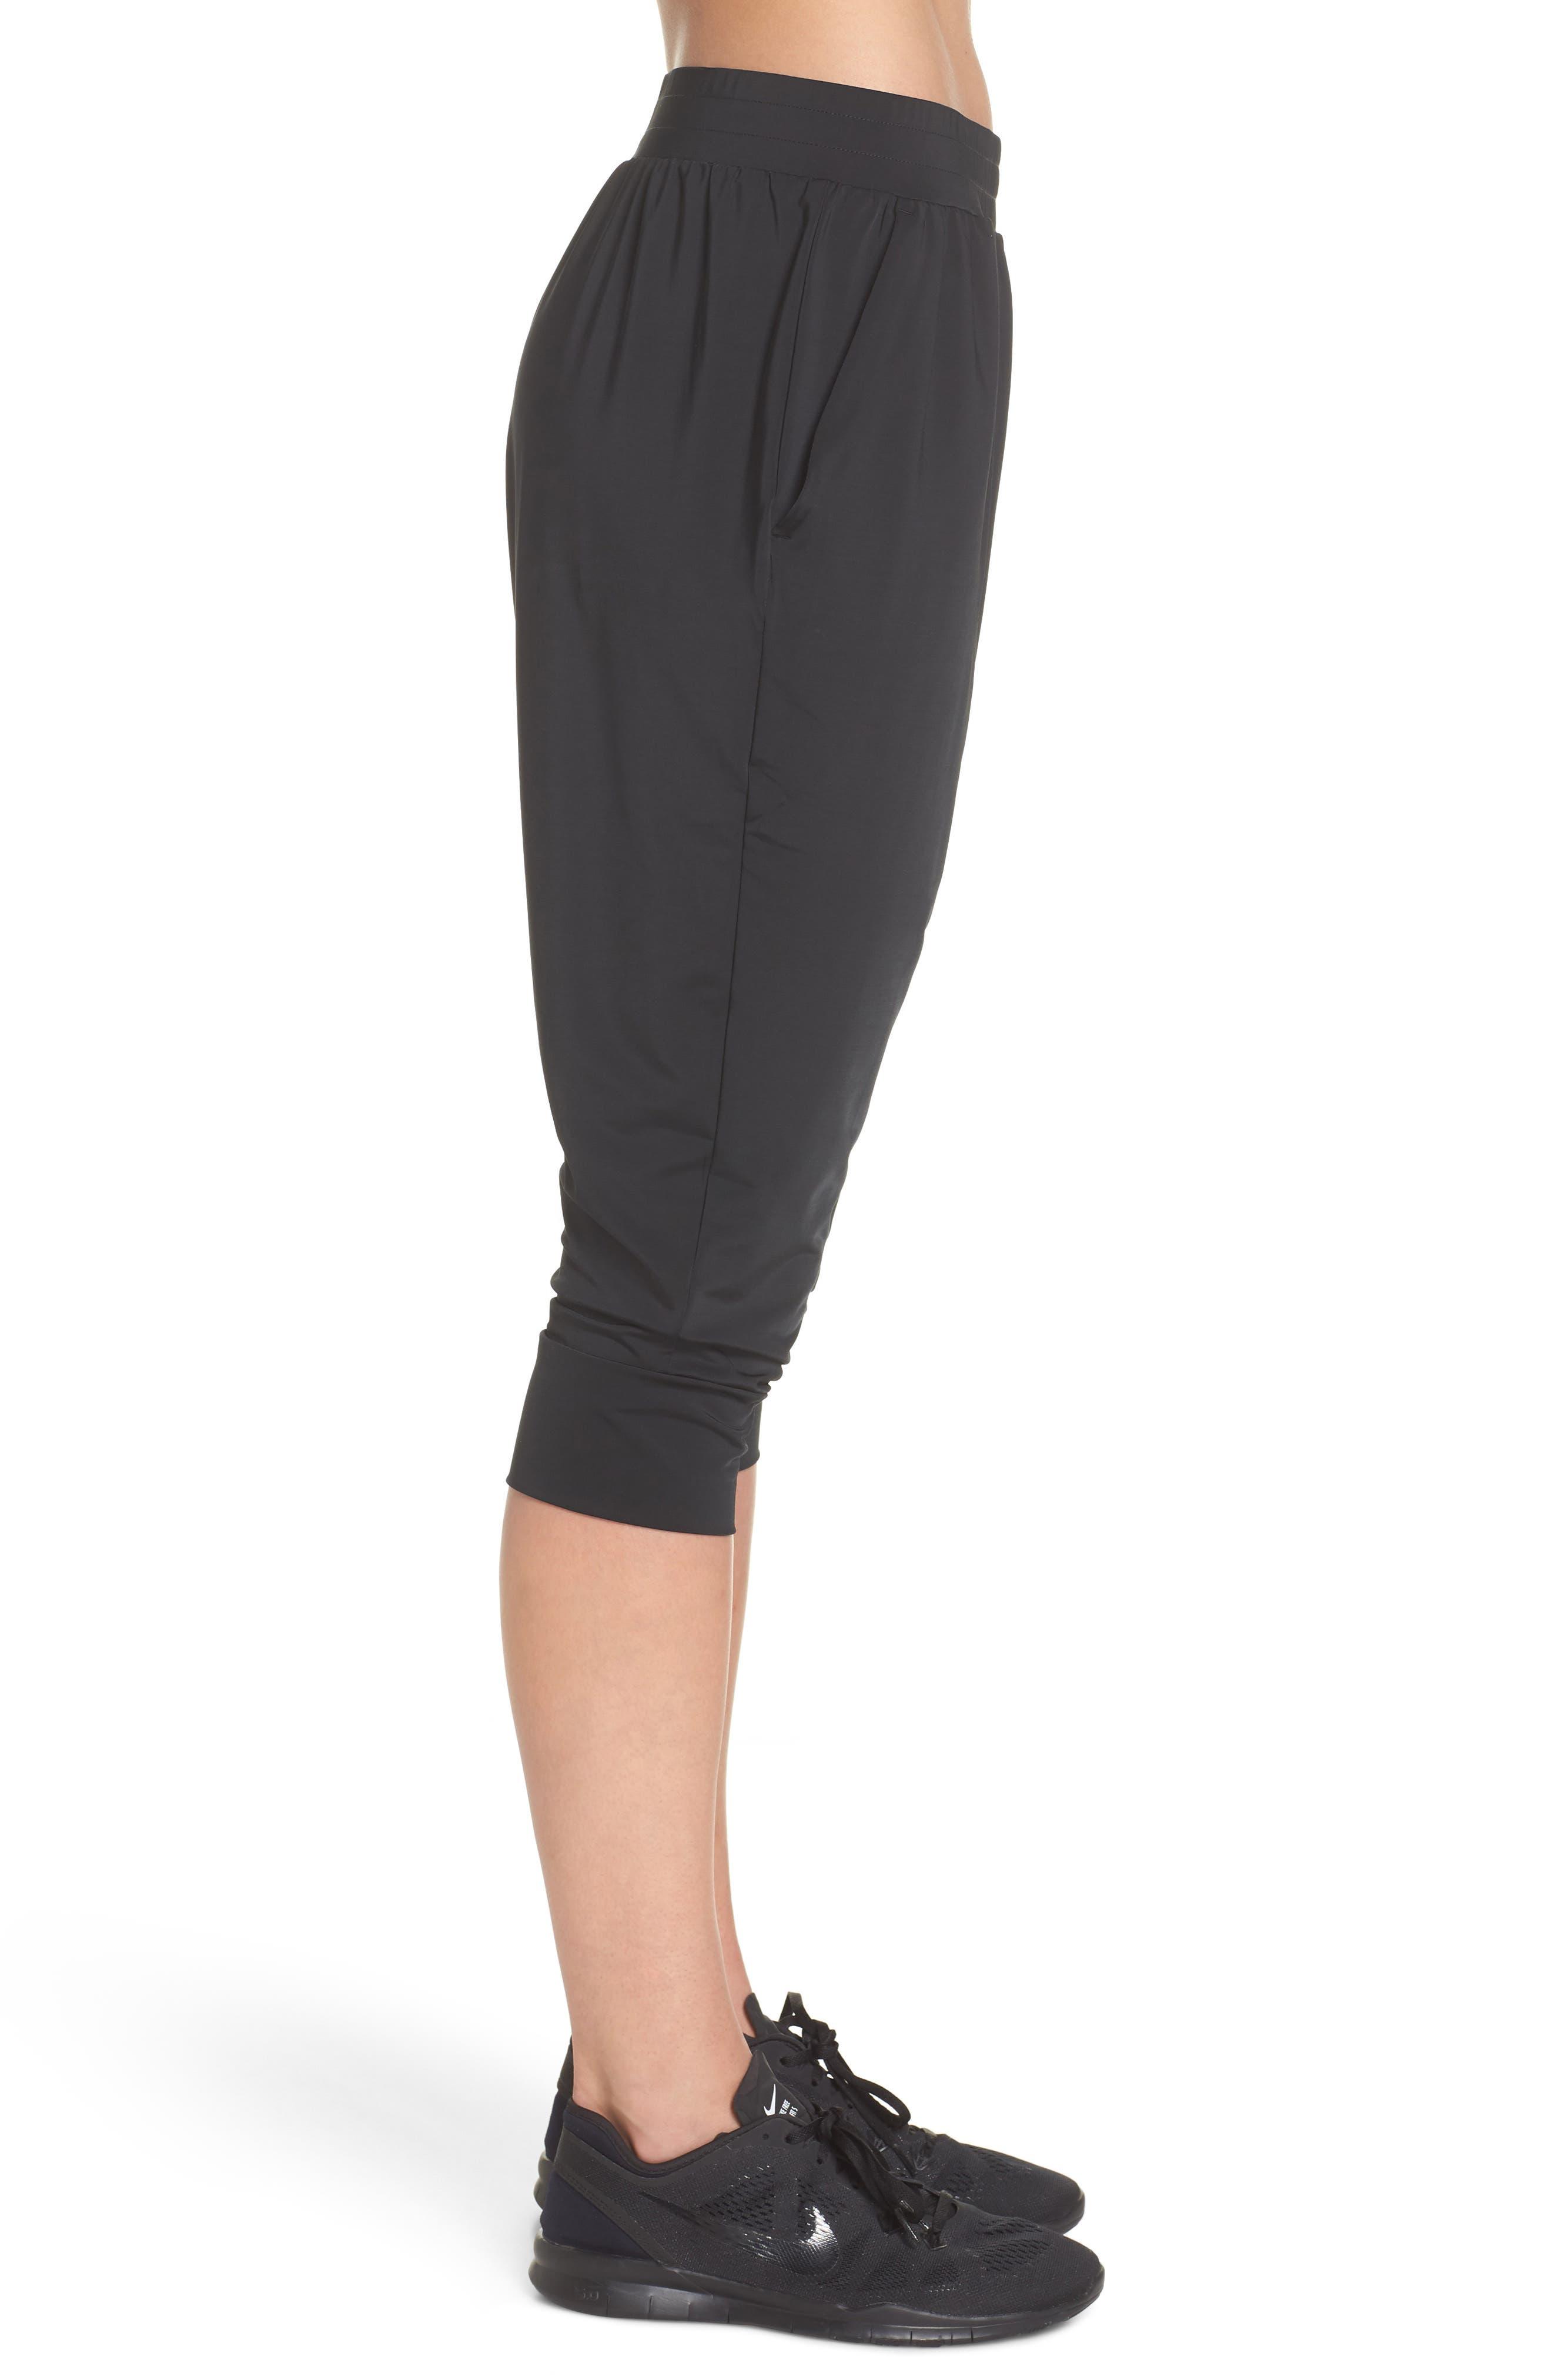 Dry Touch Training Pants,                             Alternate thumbnail 3, color,                             Black/ Black